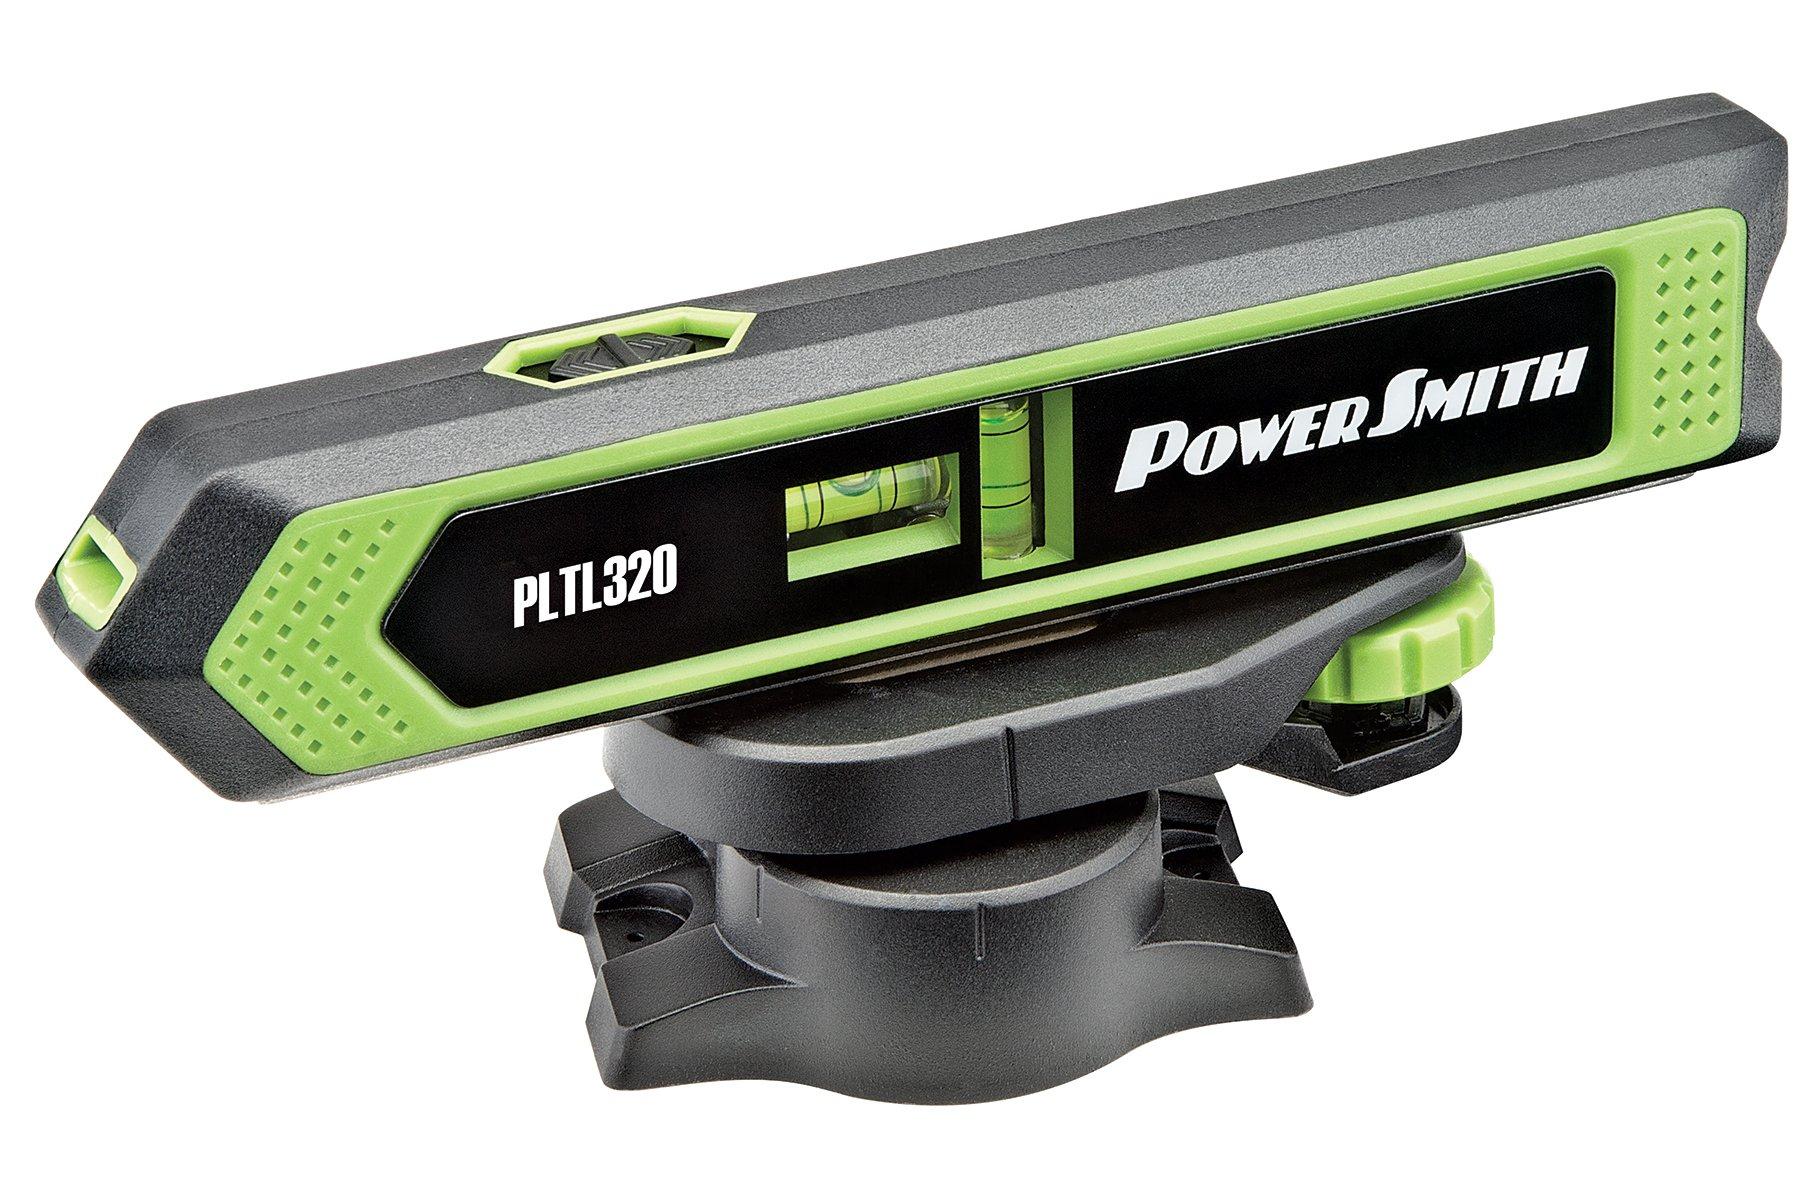 PowerSmith PLTL320 Torpedo Laser Level & Pointer by PowerSmith